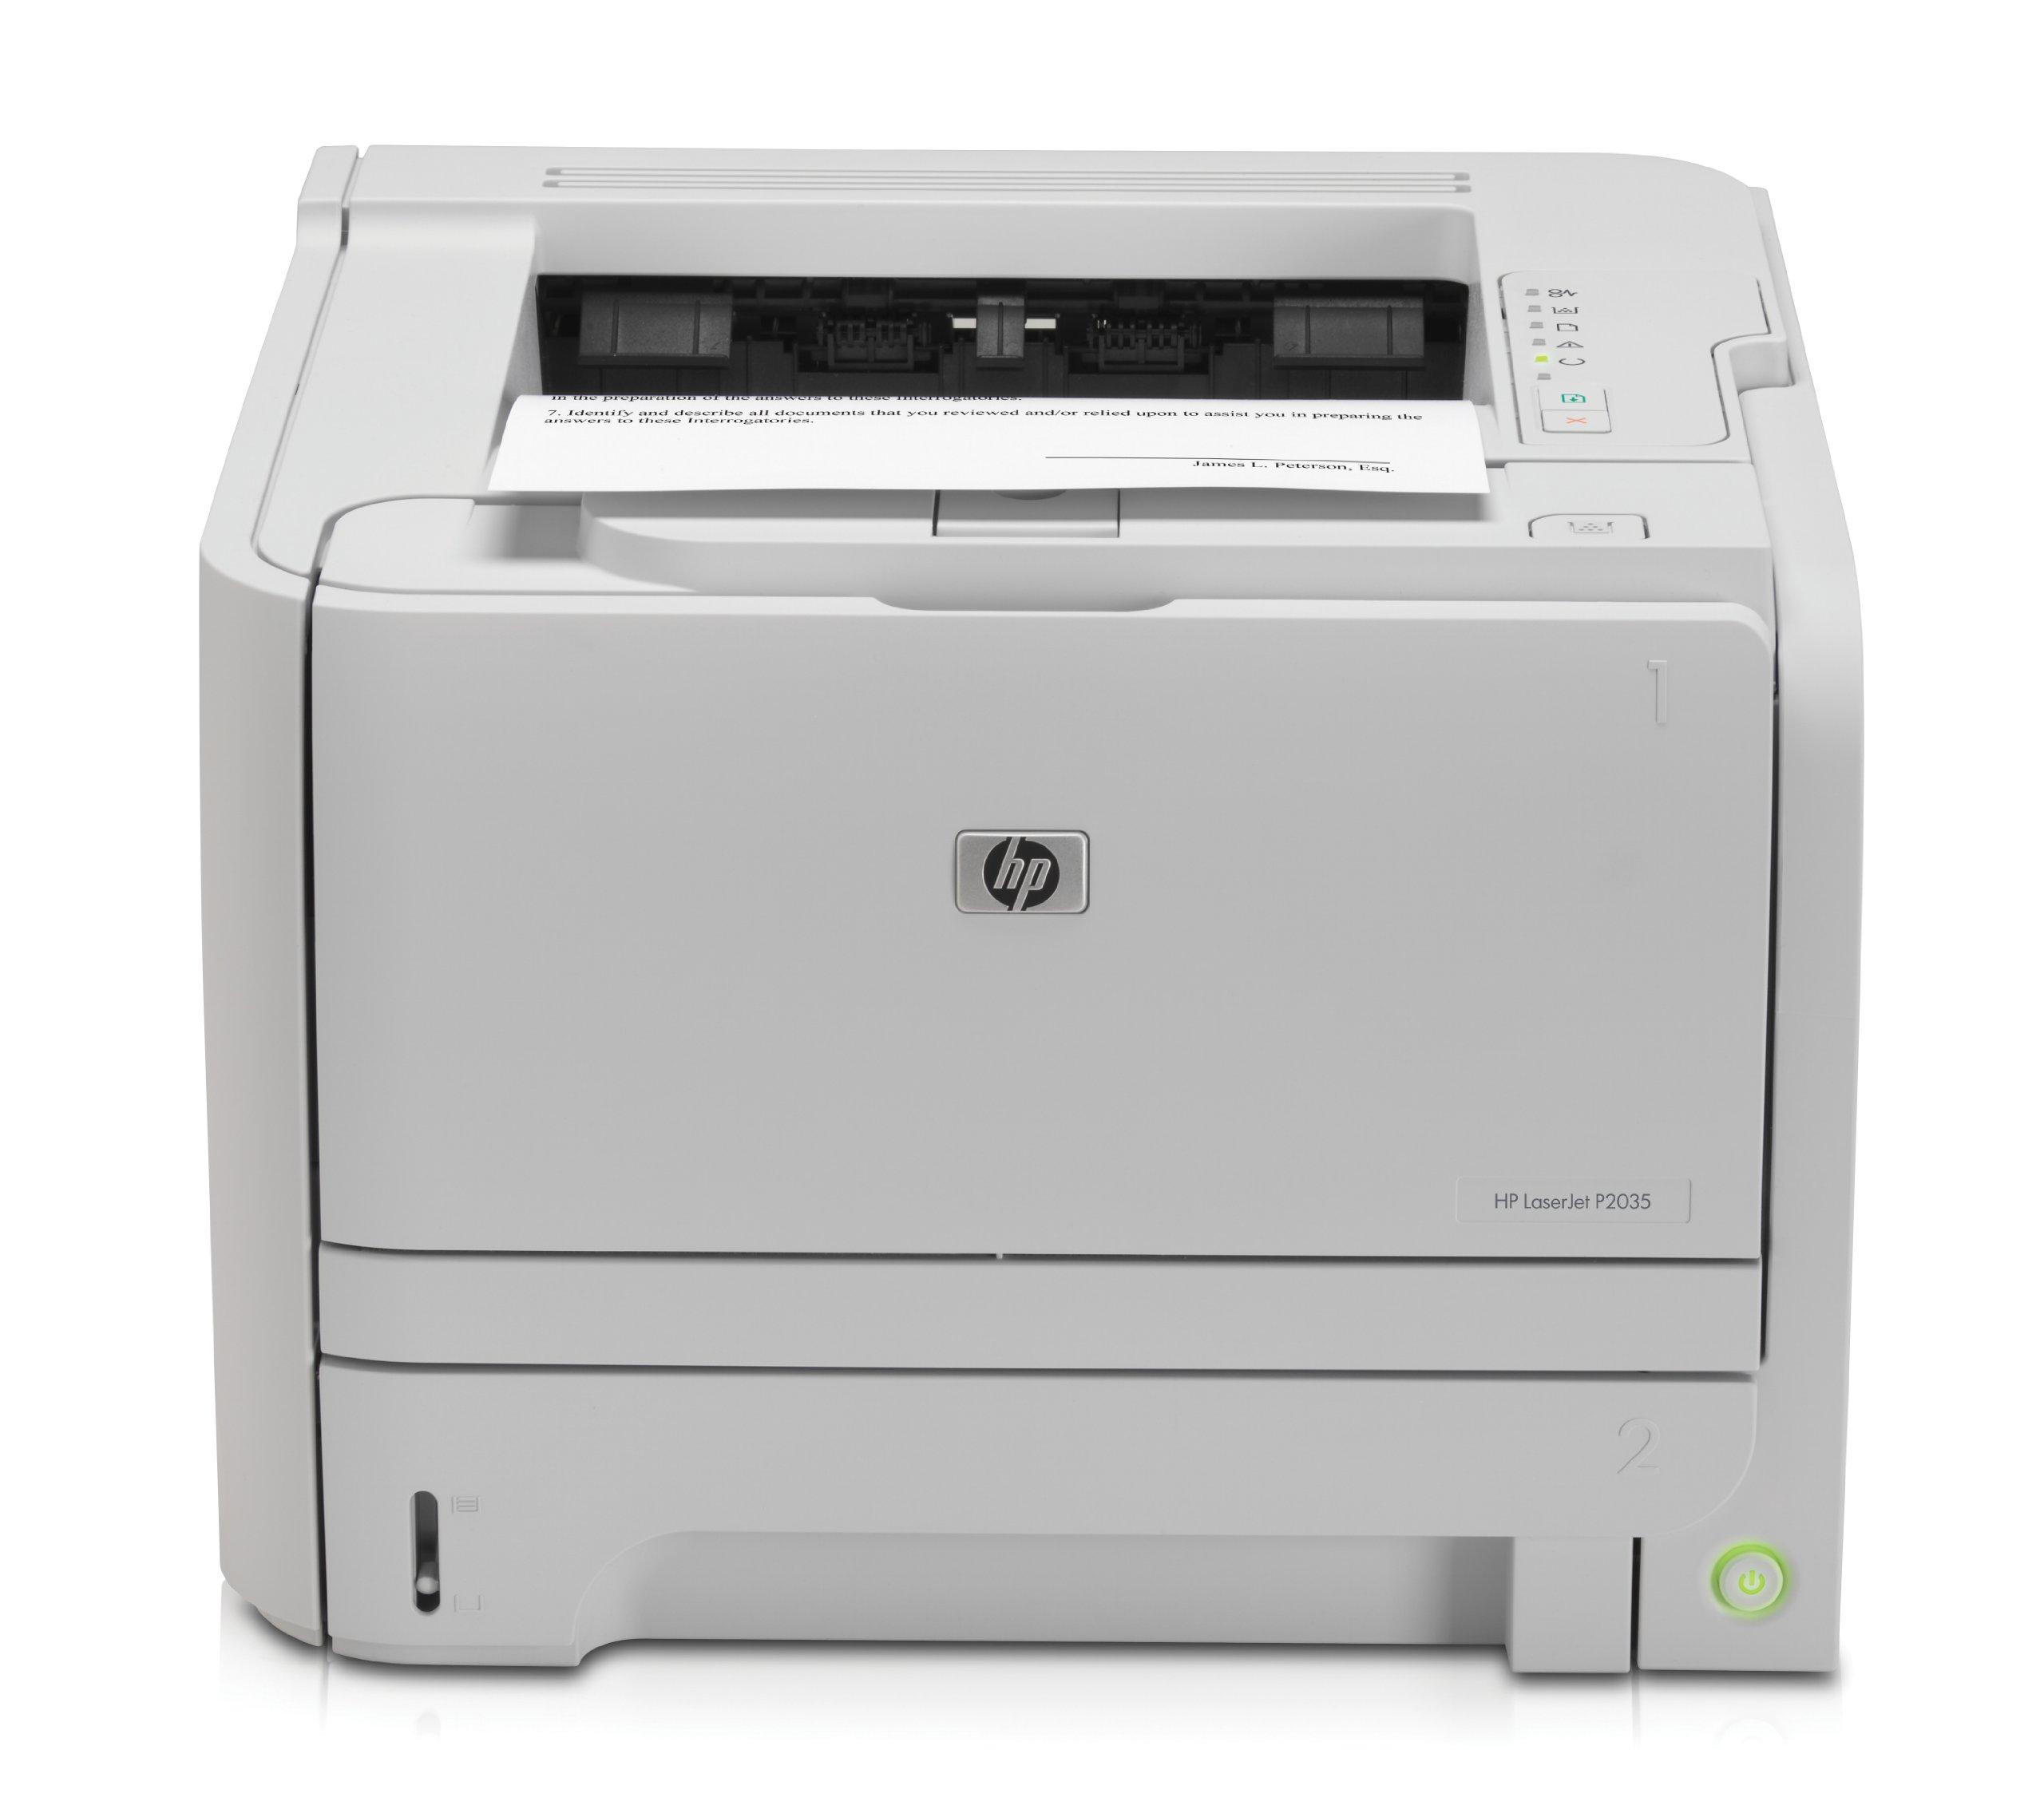 HP LaserJet P2035 Printer